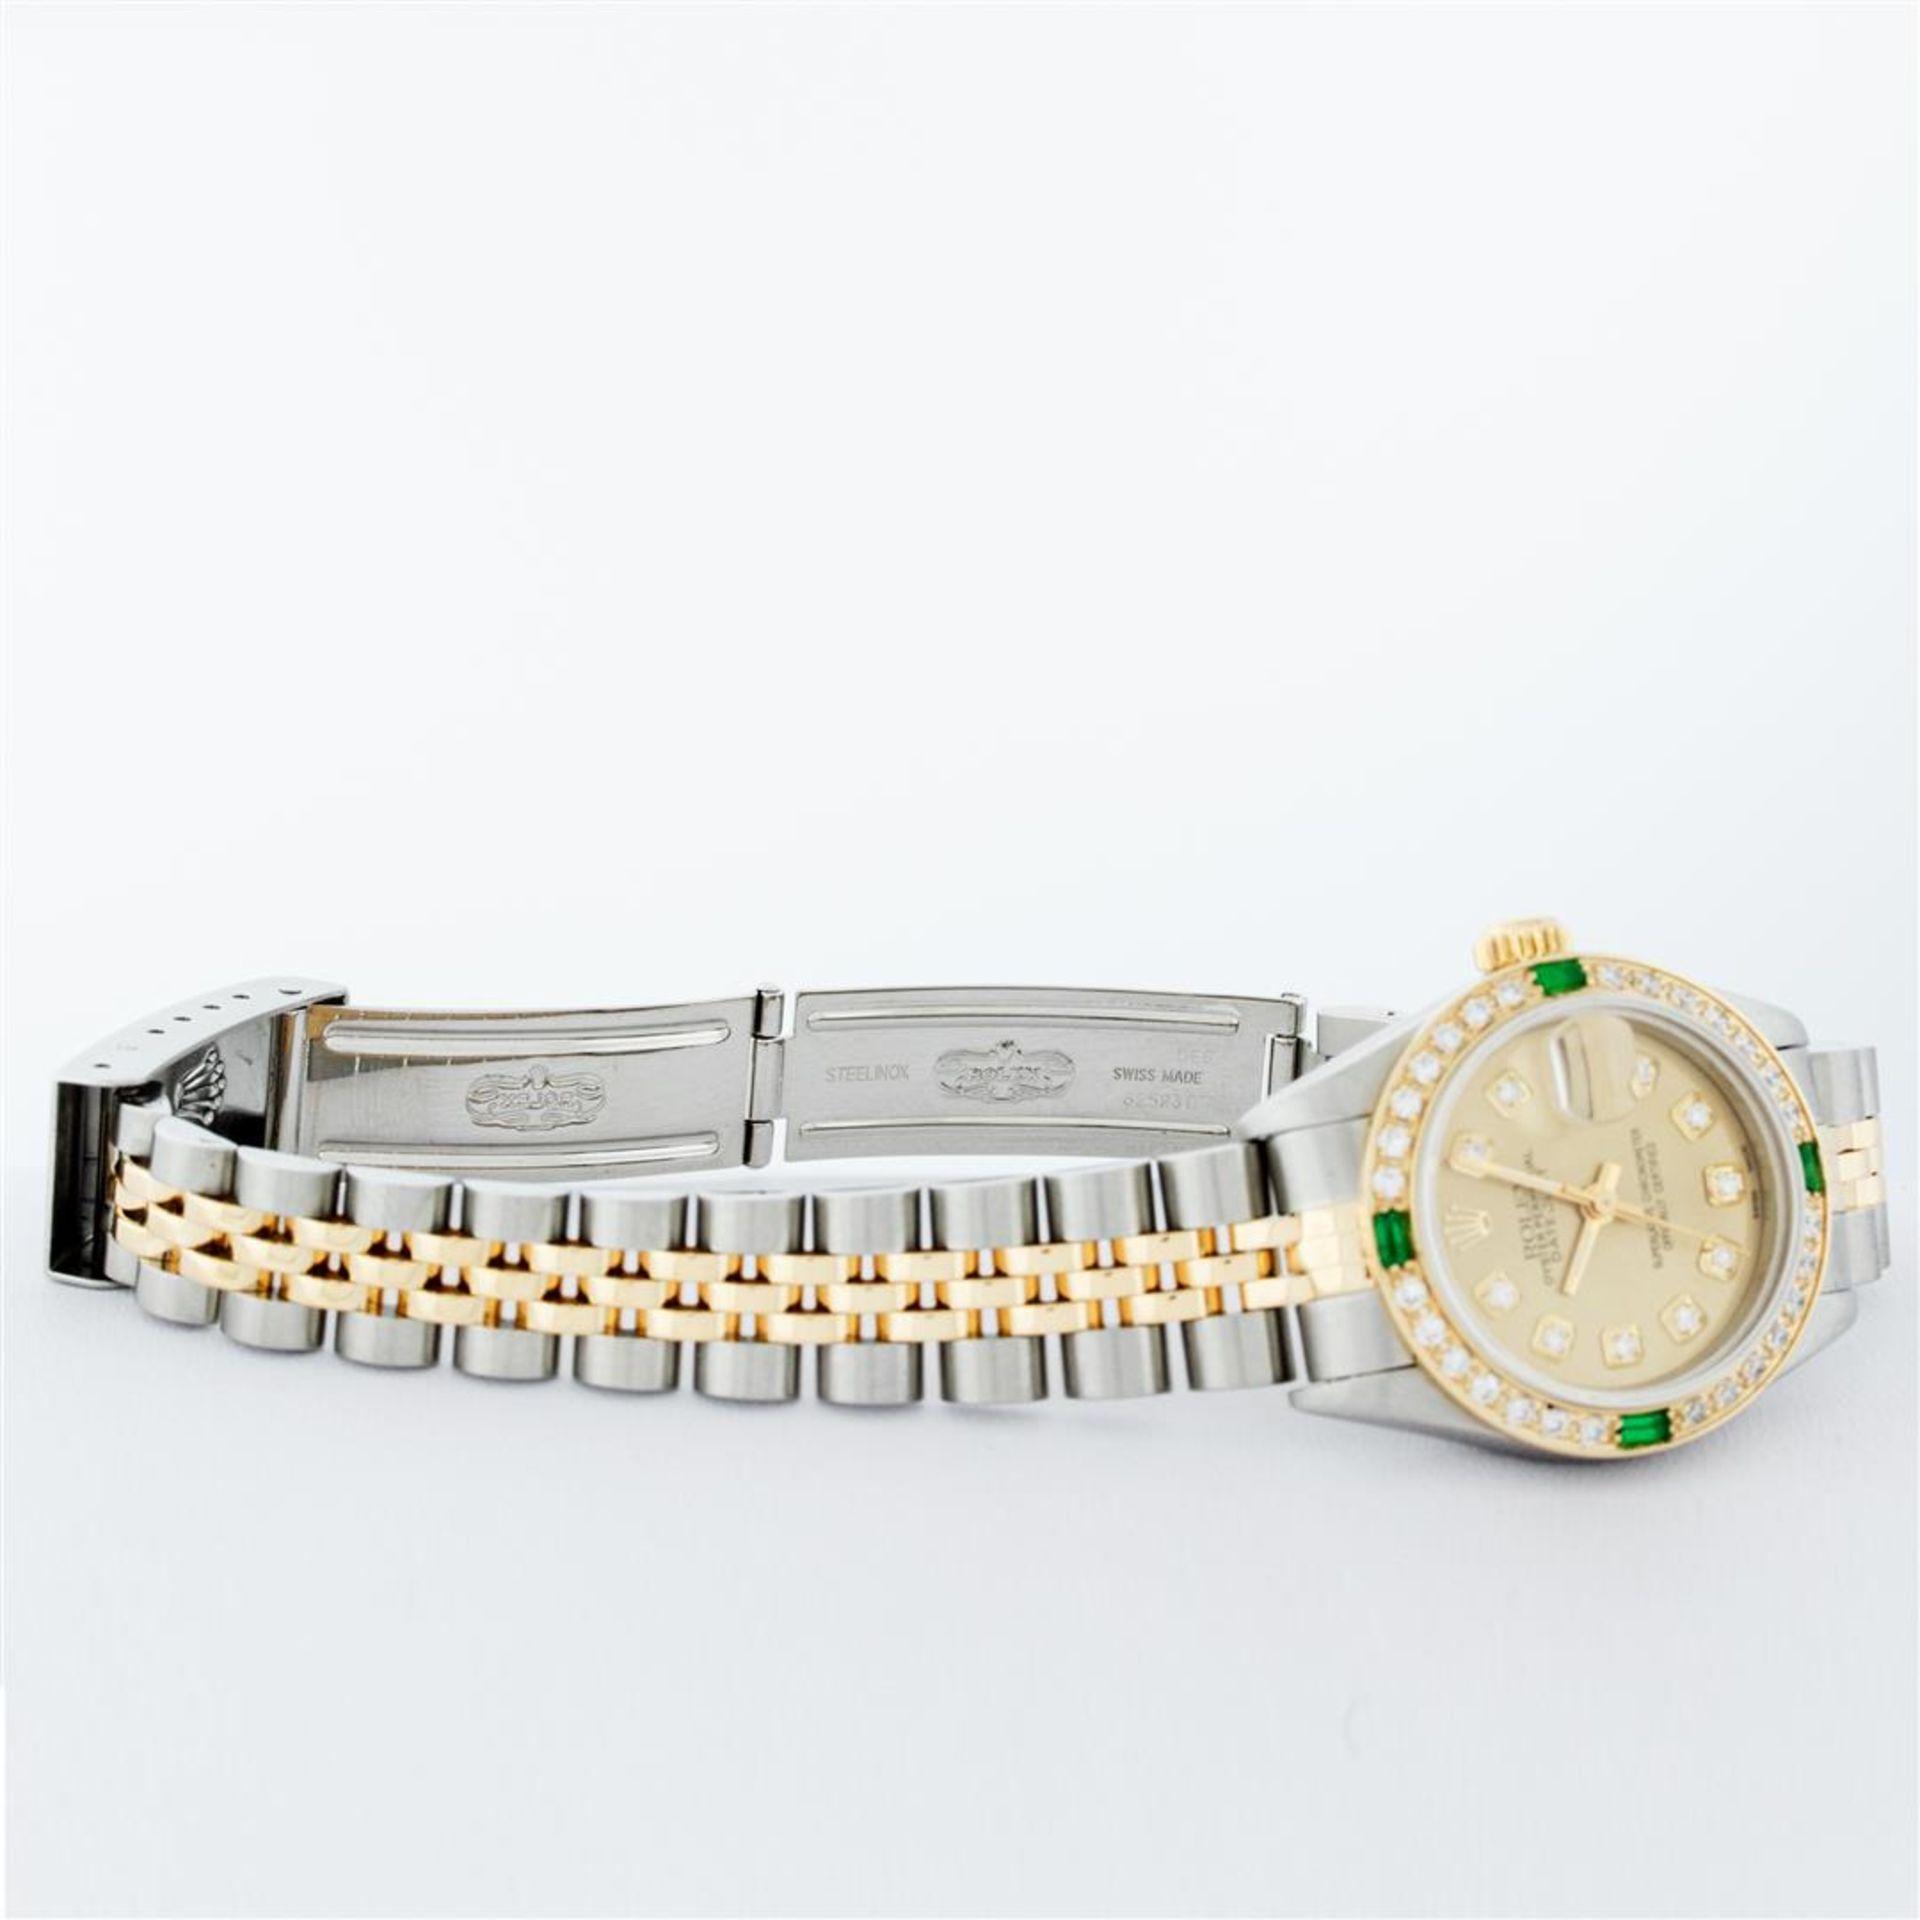 Rolex Ladies 2 Tone 18K Quickset Champagne Diamond & Emerald Datejust Wristwatch - Image 7 of 9